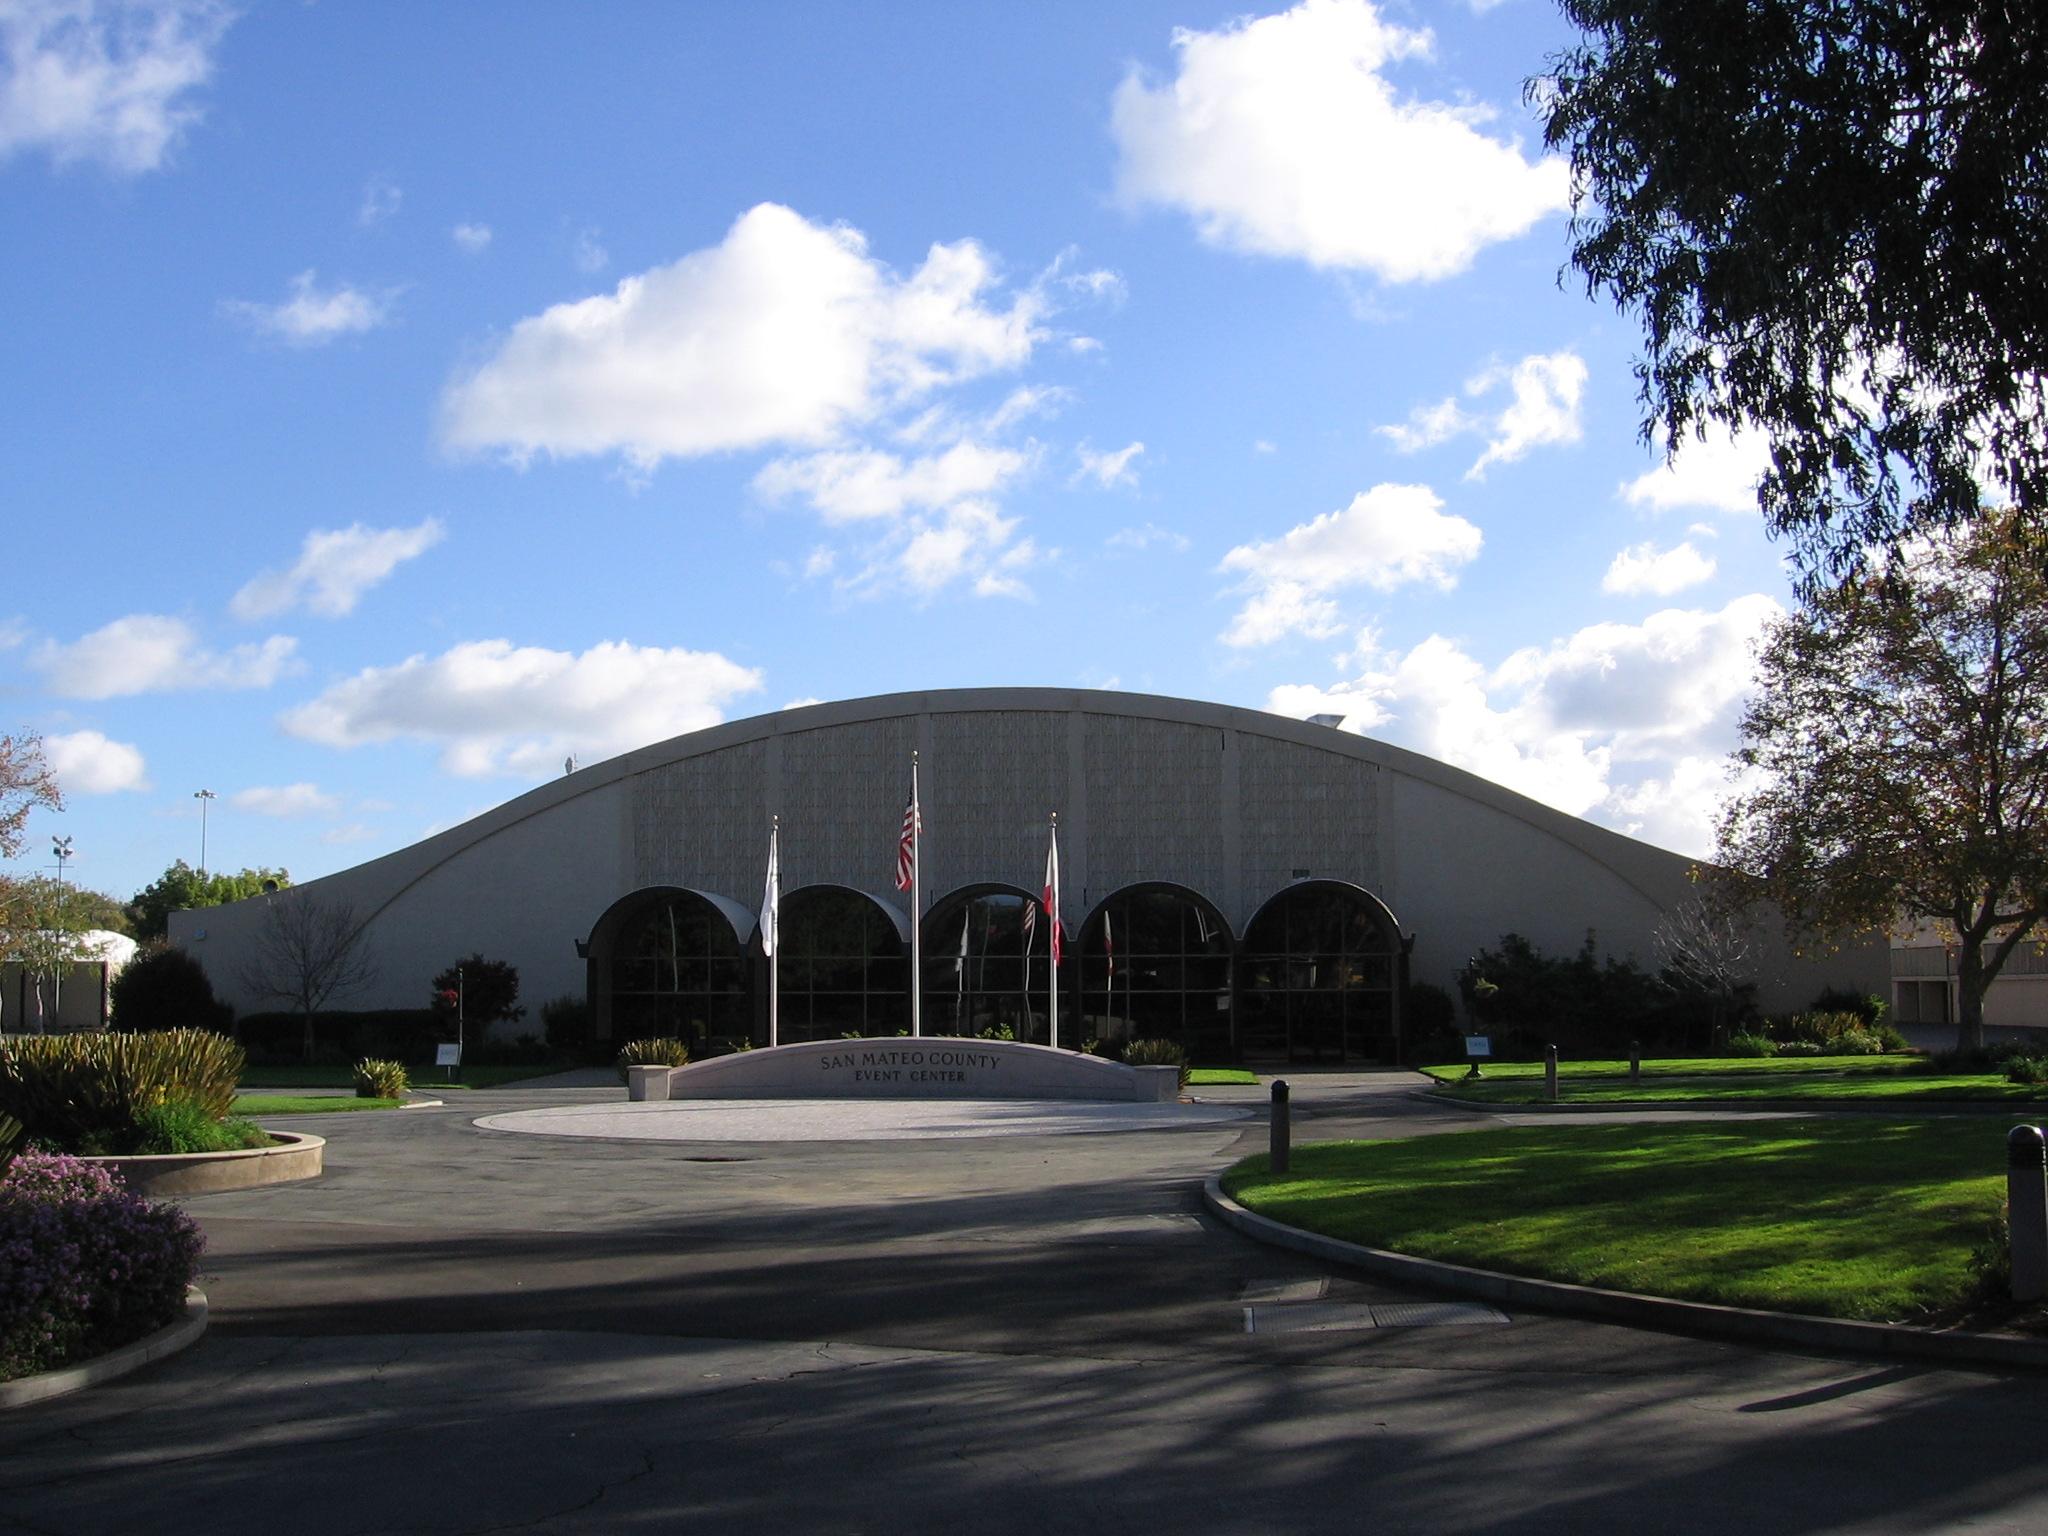 File Fiesta Hall San Mateo Fairgrounds 3091 Jpg Wikimedia Commons